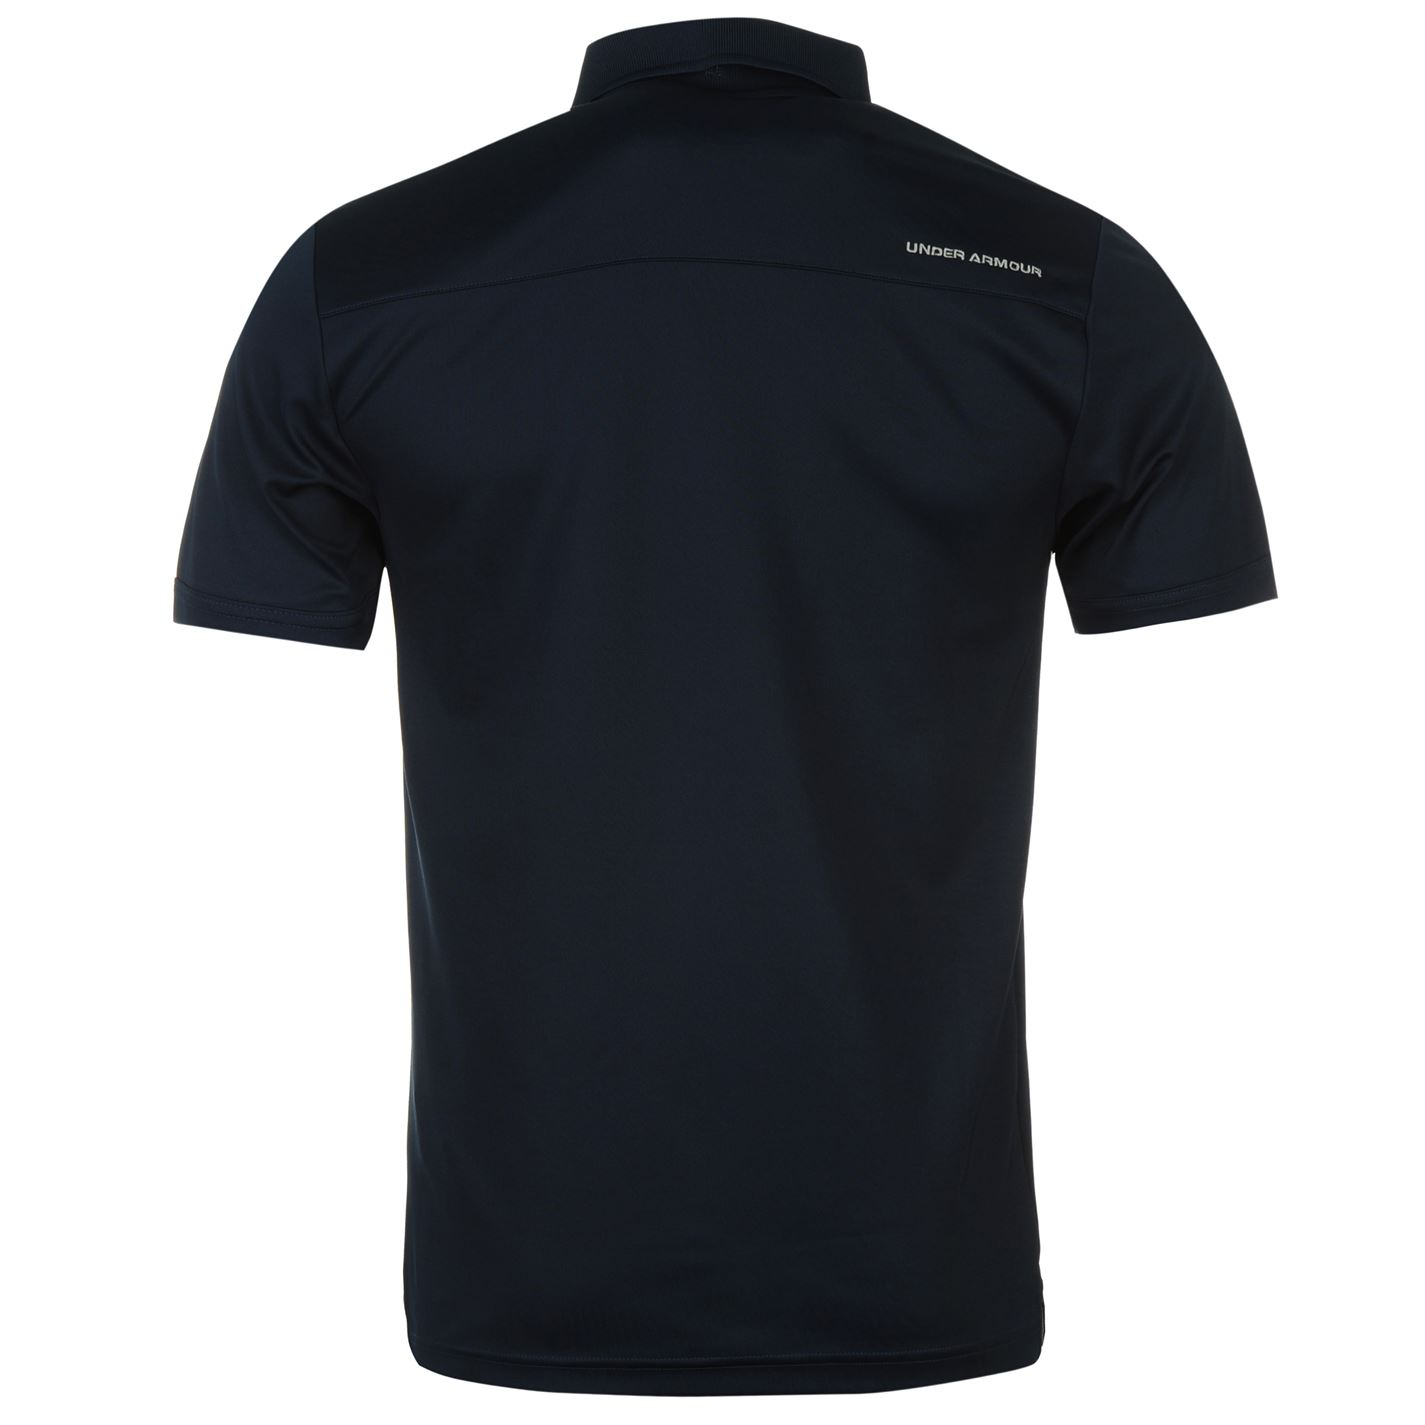 Under-Armour-Camiseta-Polo-para-hombre-realizar-Manga-Corta-Camiseta-Top-Golf-Deportes miniatura 33